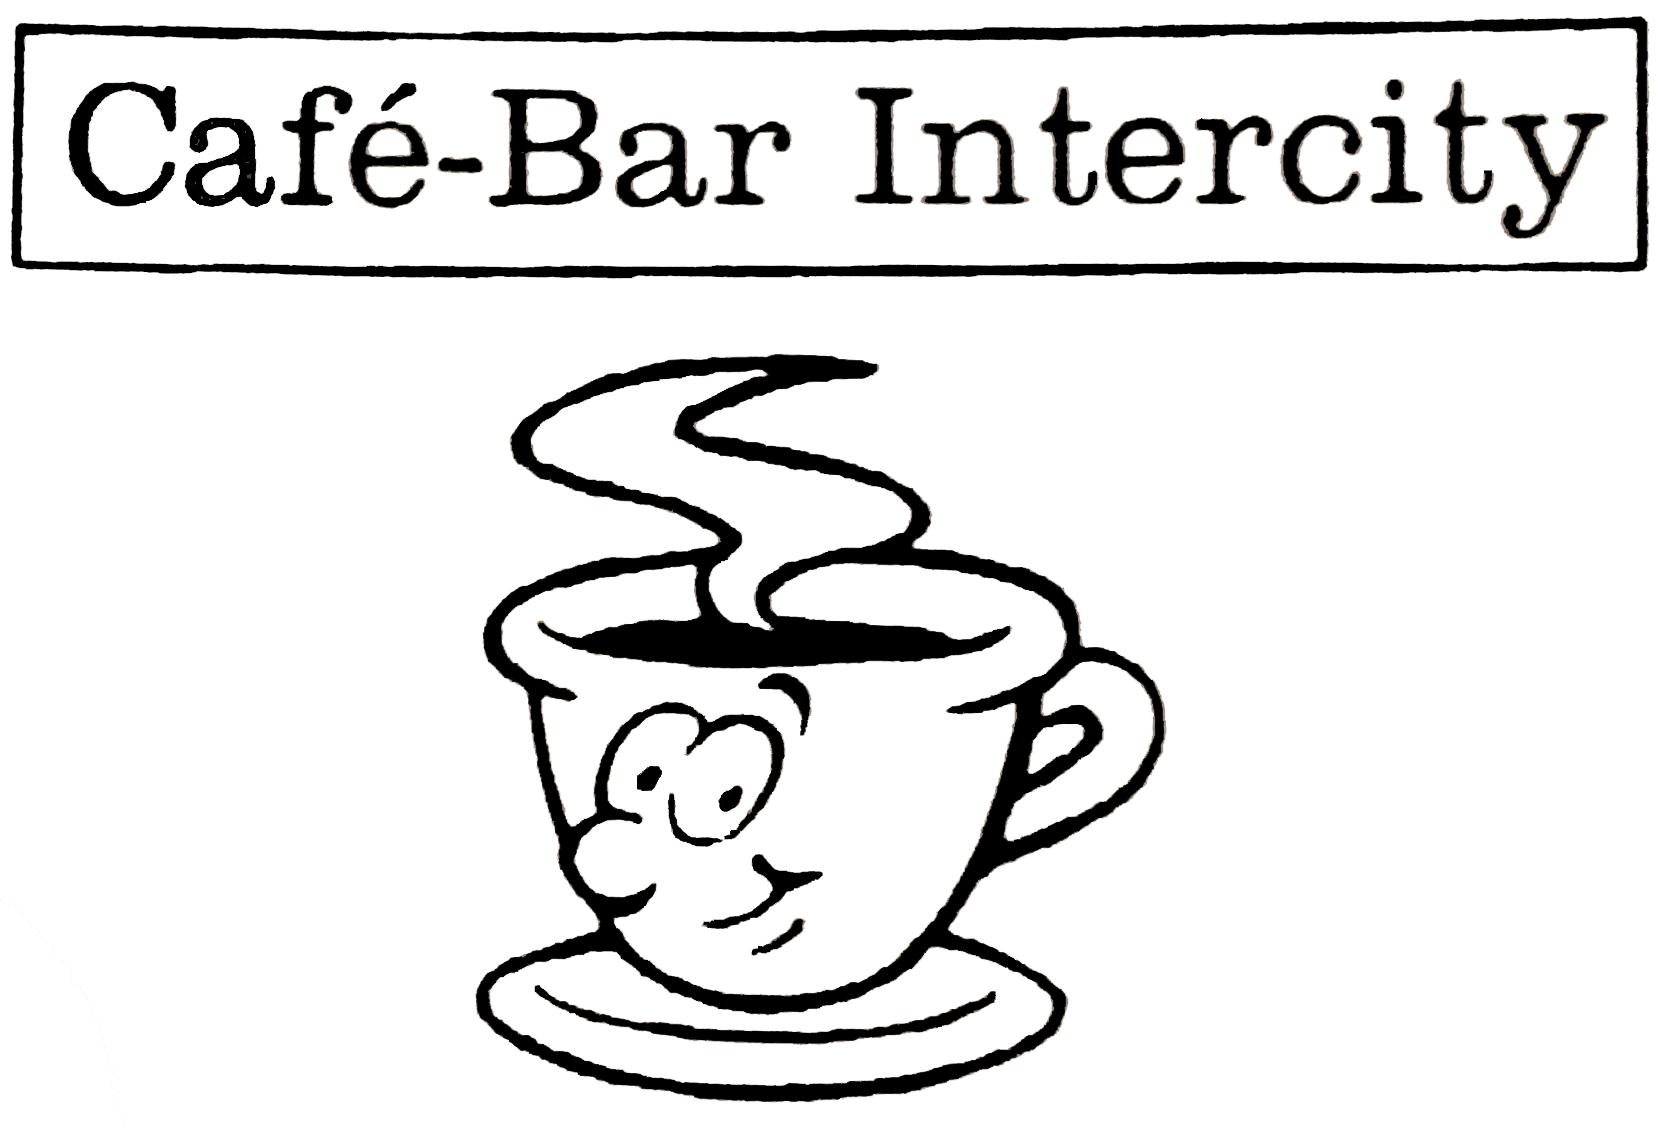 Café-Bar Intercity